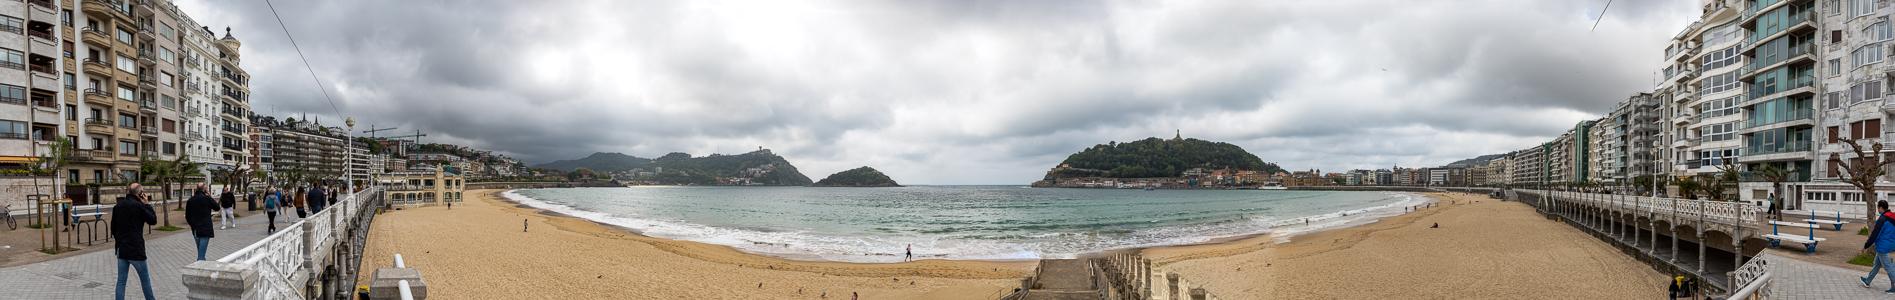 Donostia-San Sebastián Bahía de La Concha mit dem Playa de La Concha Isla de Santa Clara Monte Igueldo Monte Urgull